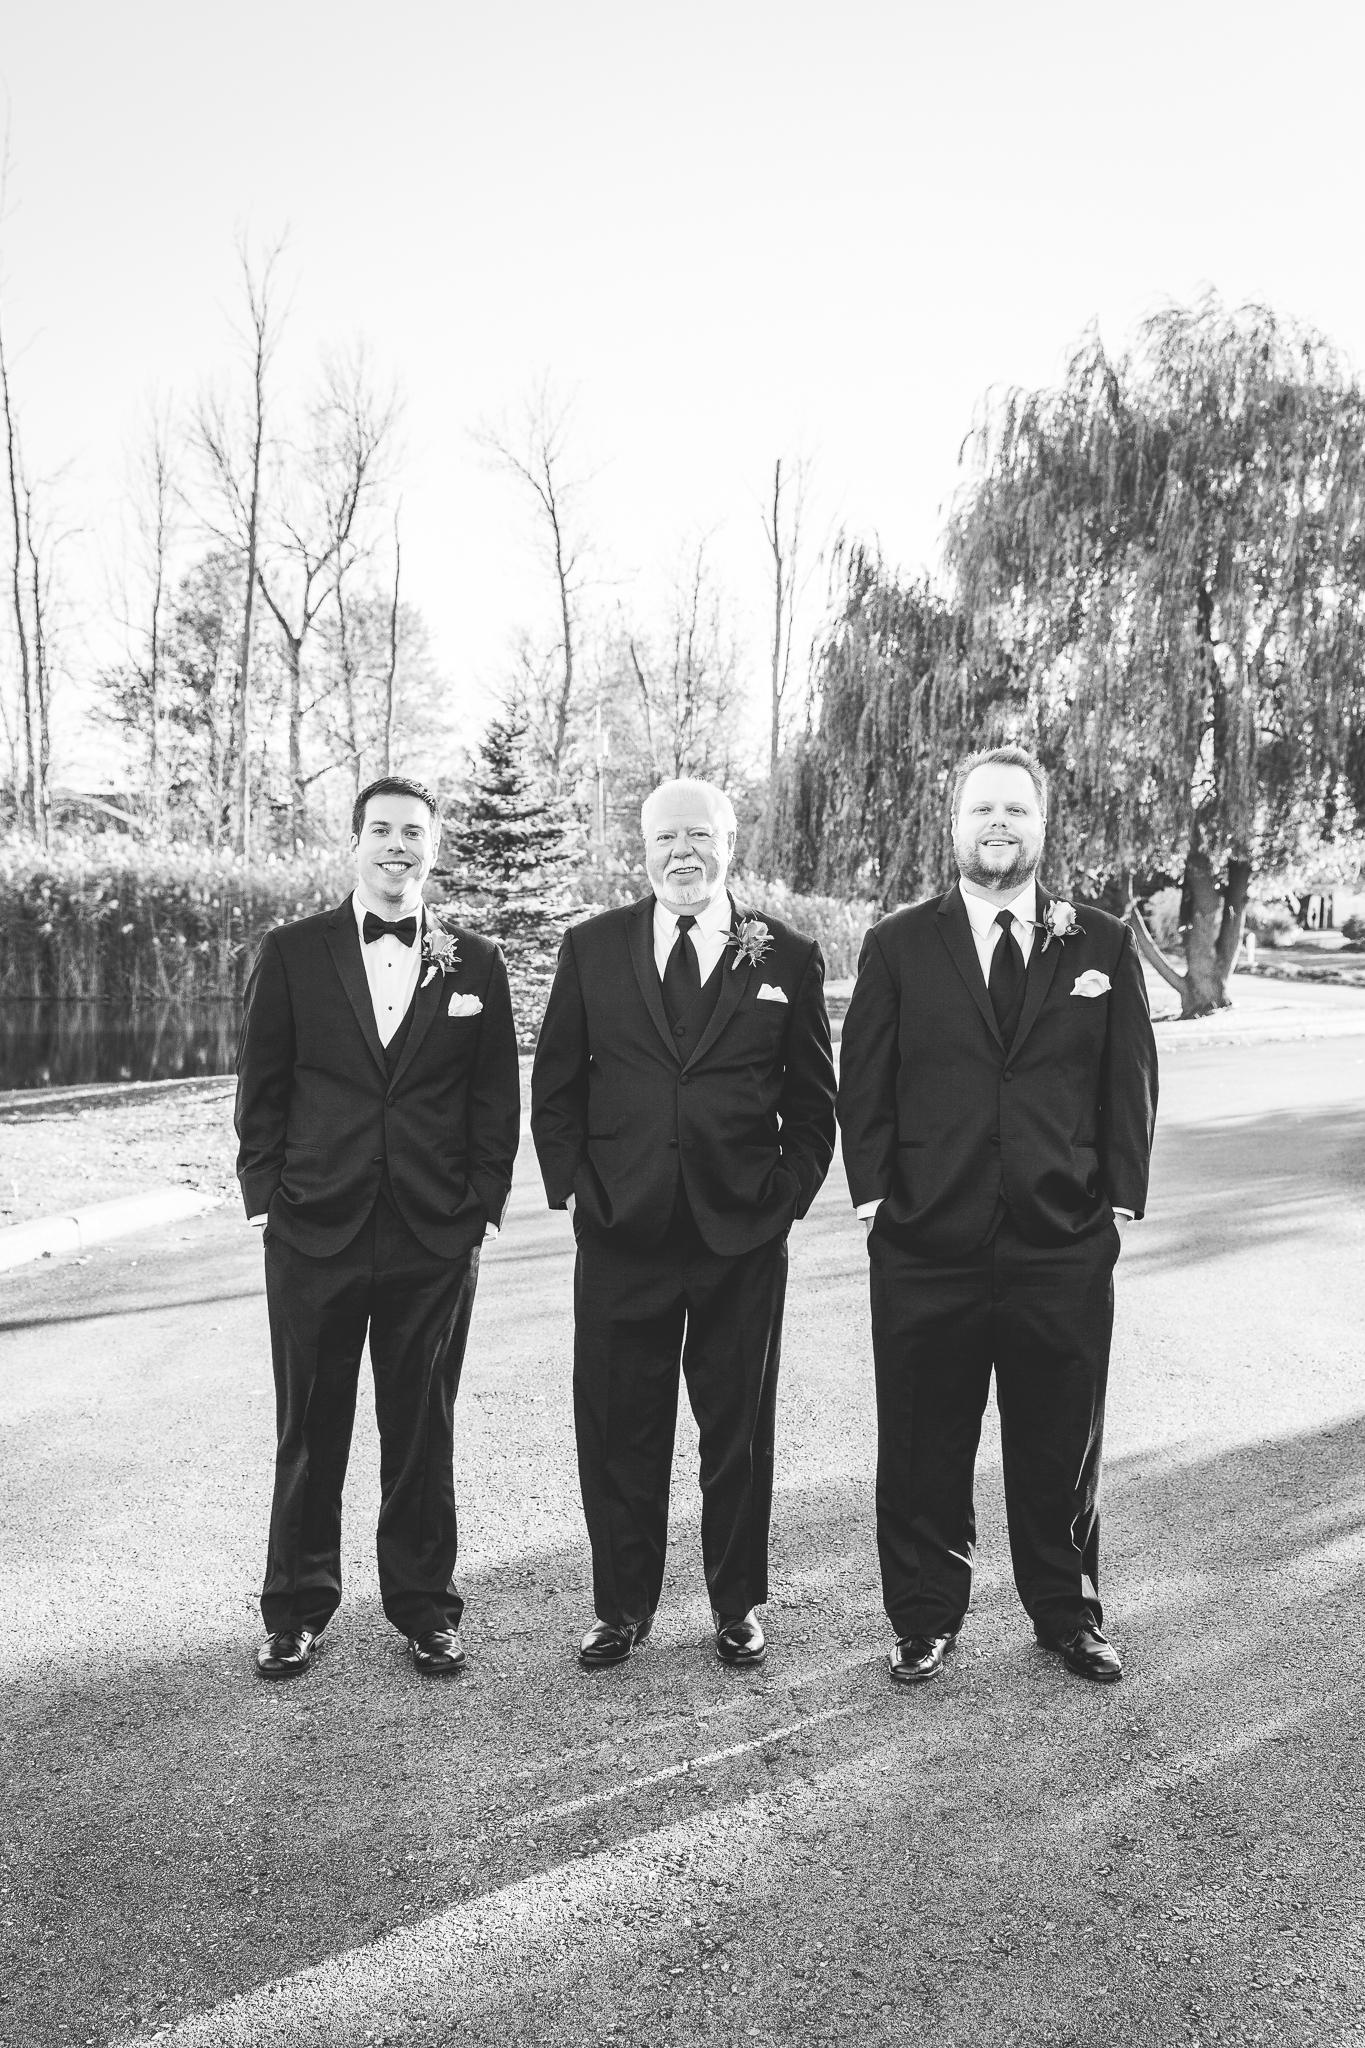 camuglia-whomstudio-chelsea_and_andy-nycphotographer-wedding-brooklyn-buffalo-timberlodge-039-0254.jpg